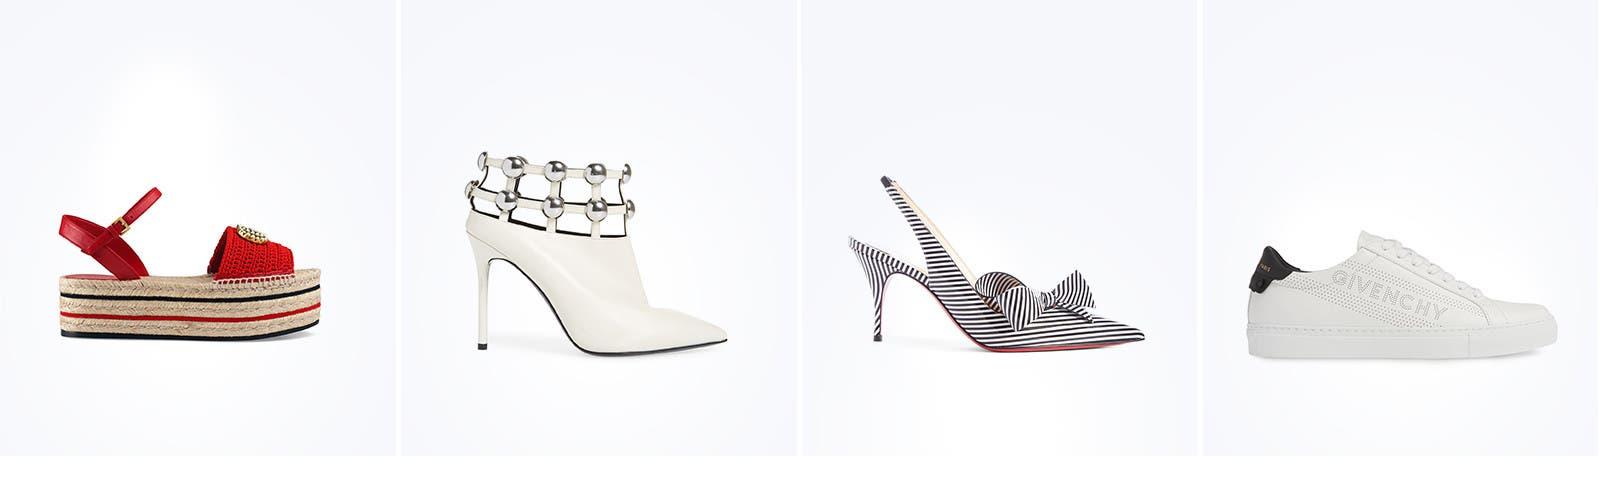 Designer shoes for women.